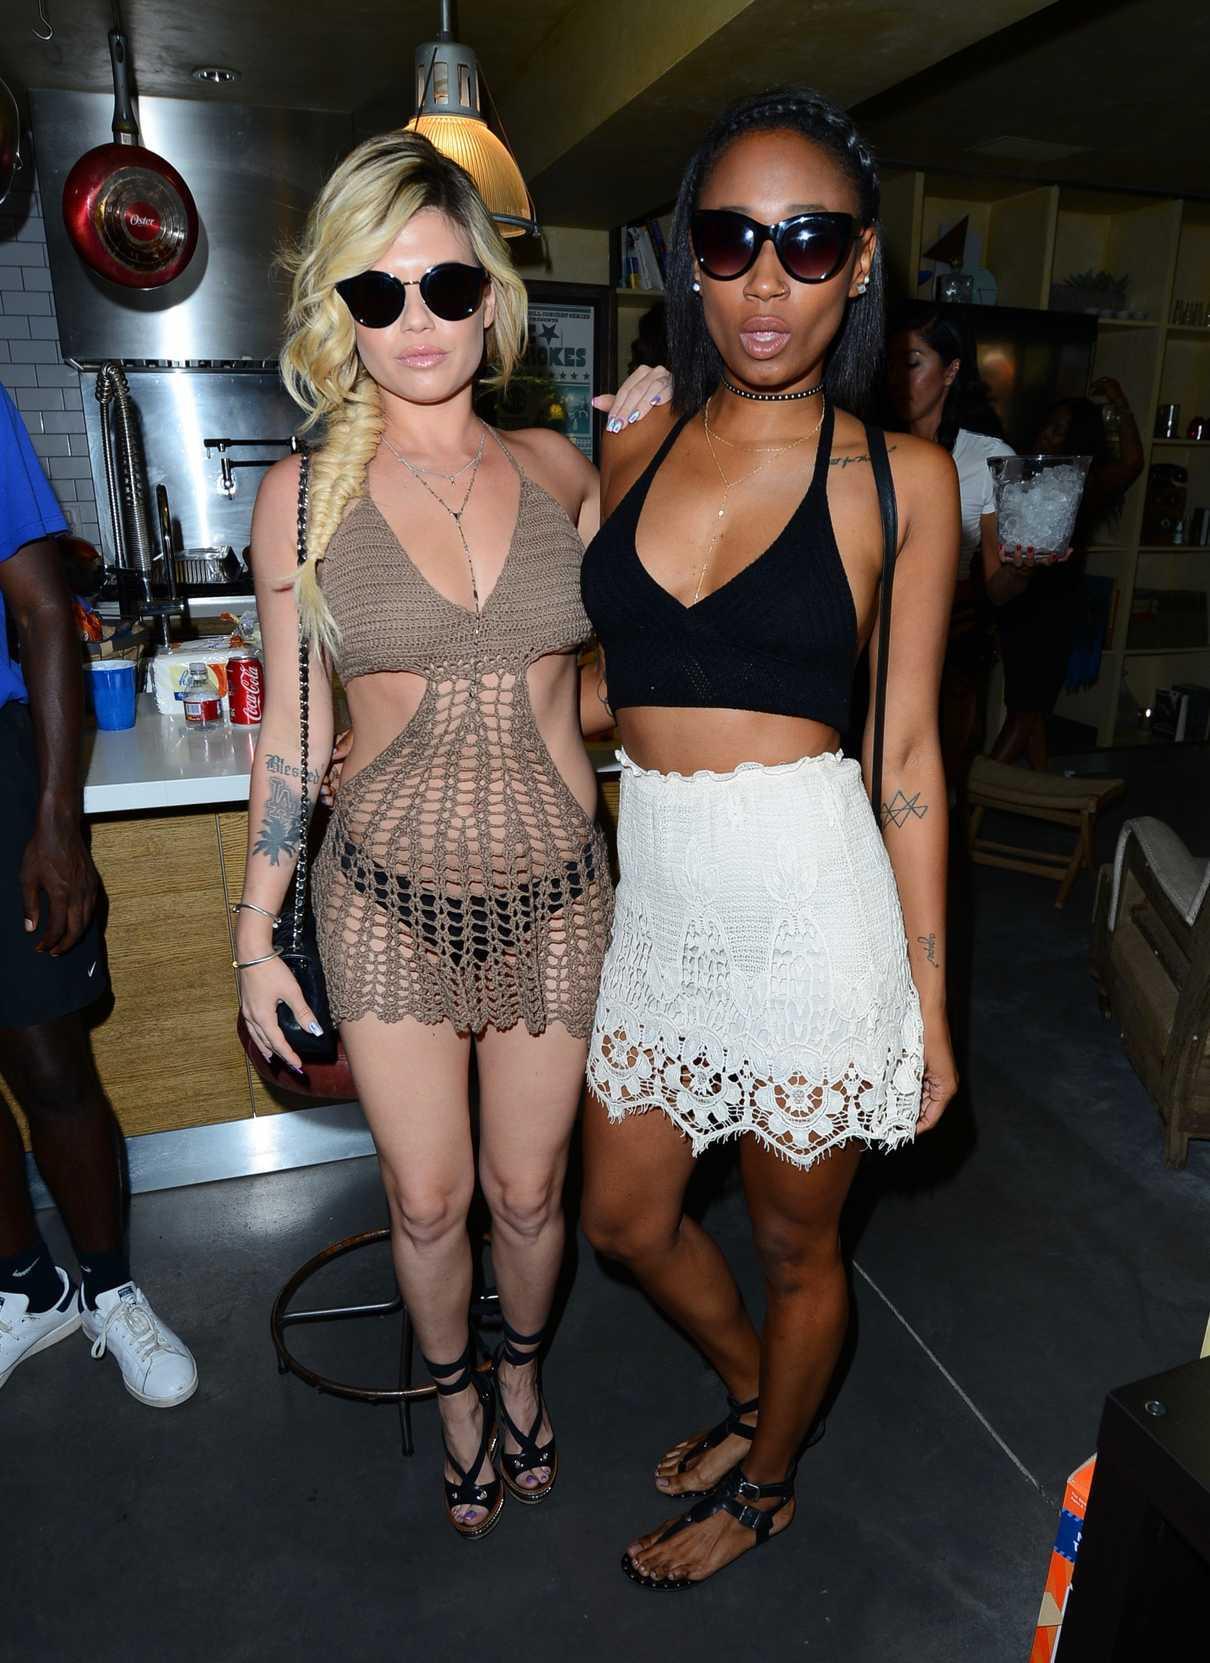 [PIC] Chanel West Coast Topless — Scandalous Pics Leak Of